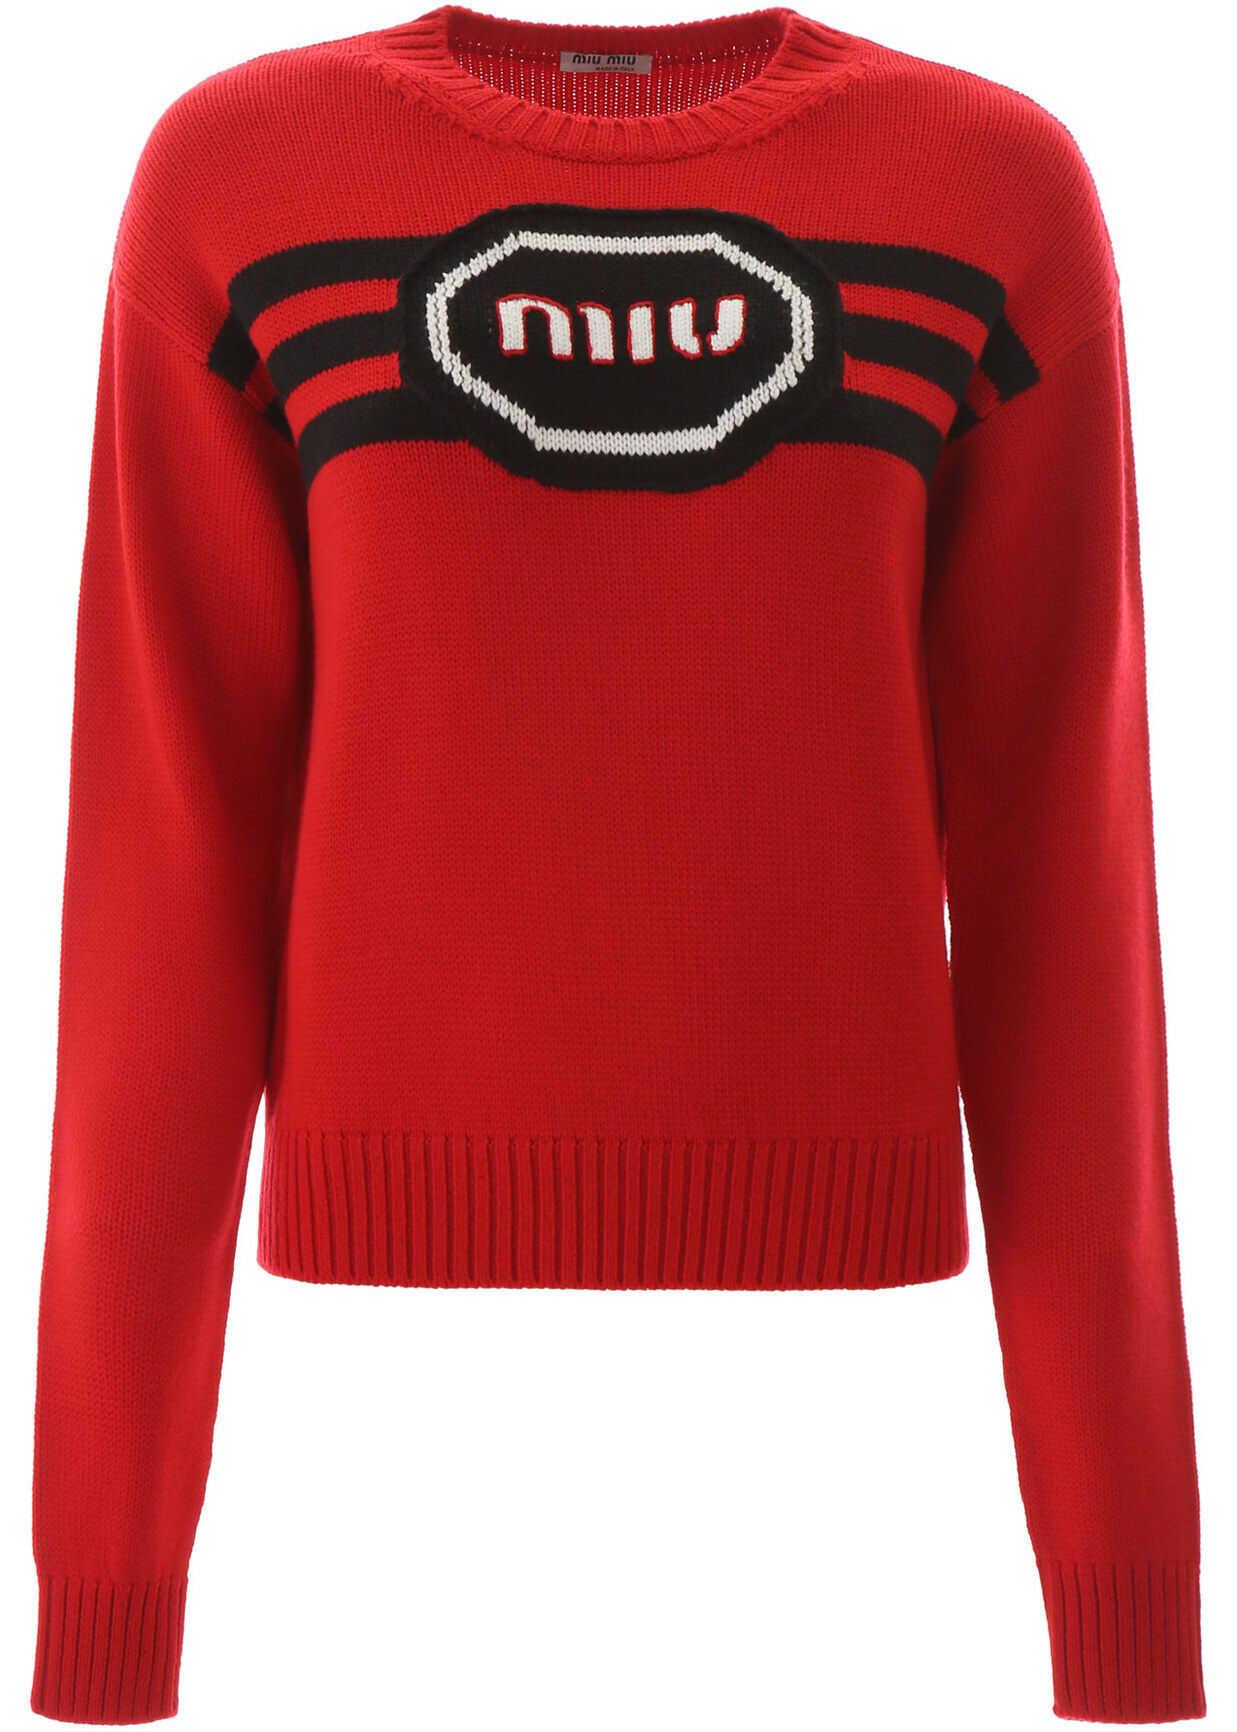 Miu Miu Logo Embroidery Sweater ROSSO